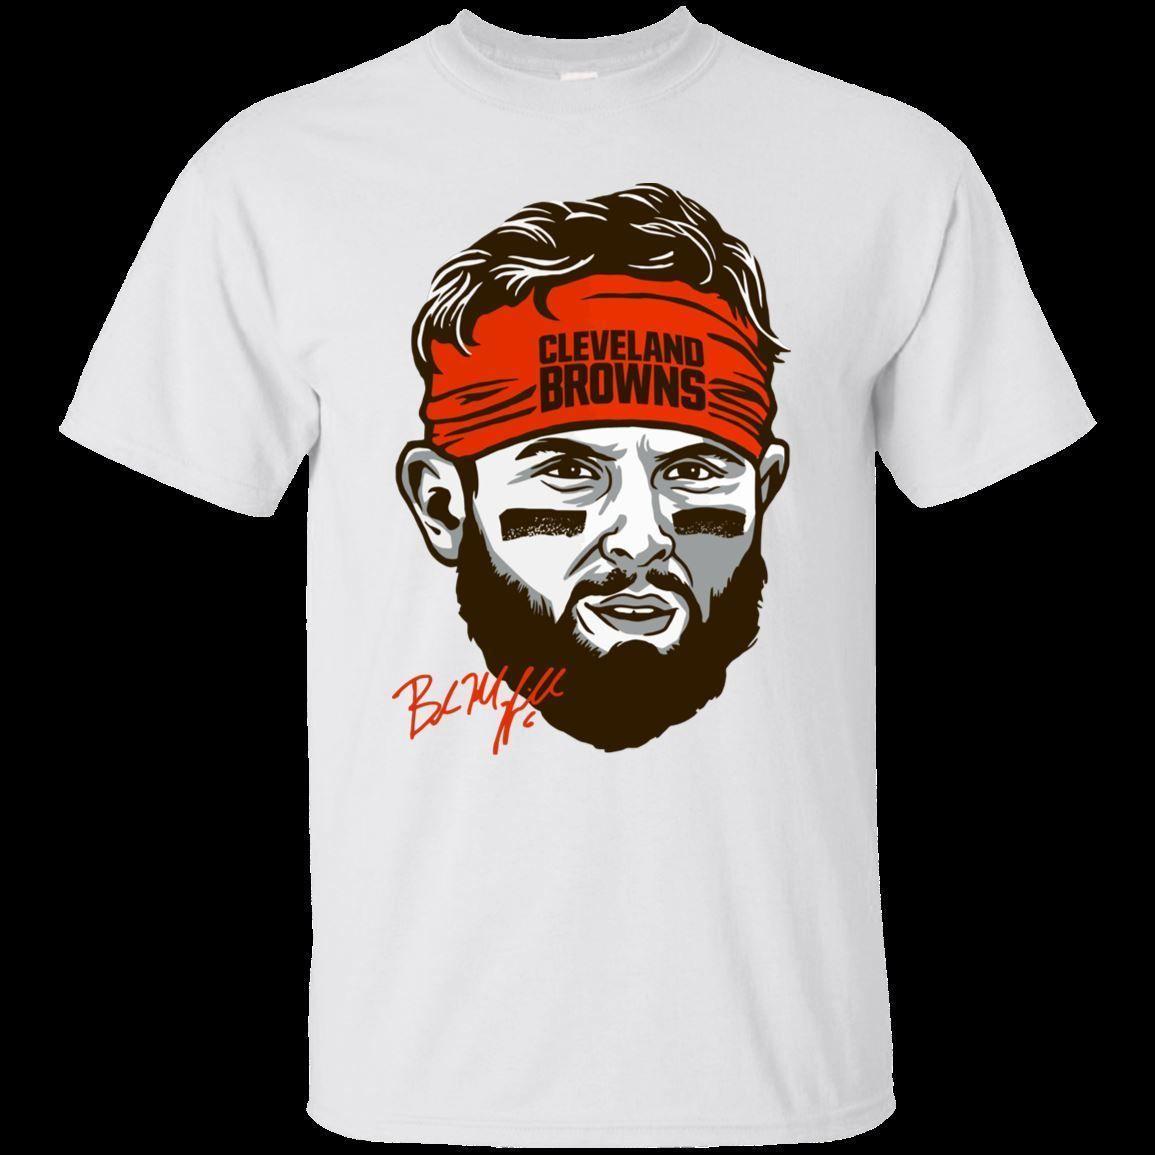 new product a520e 36c82 Baker Mayfield Face T-shirt Top tees Football Men s Tee Short Sleeve